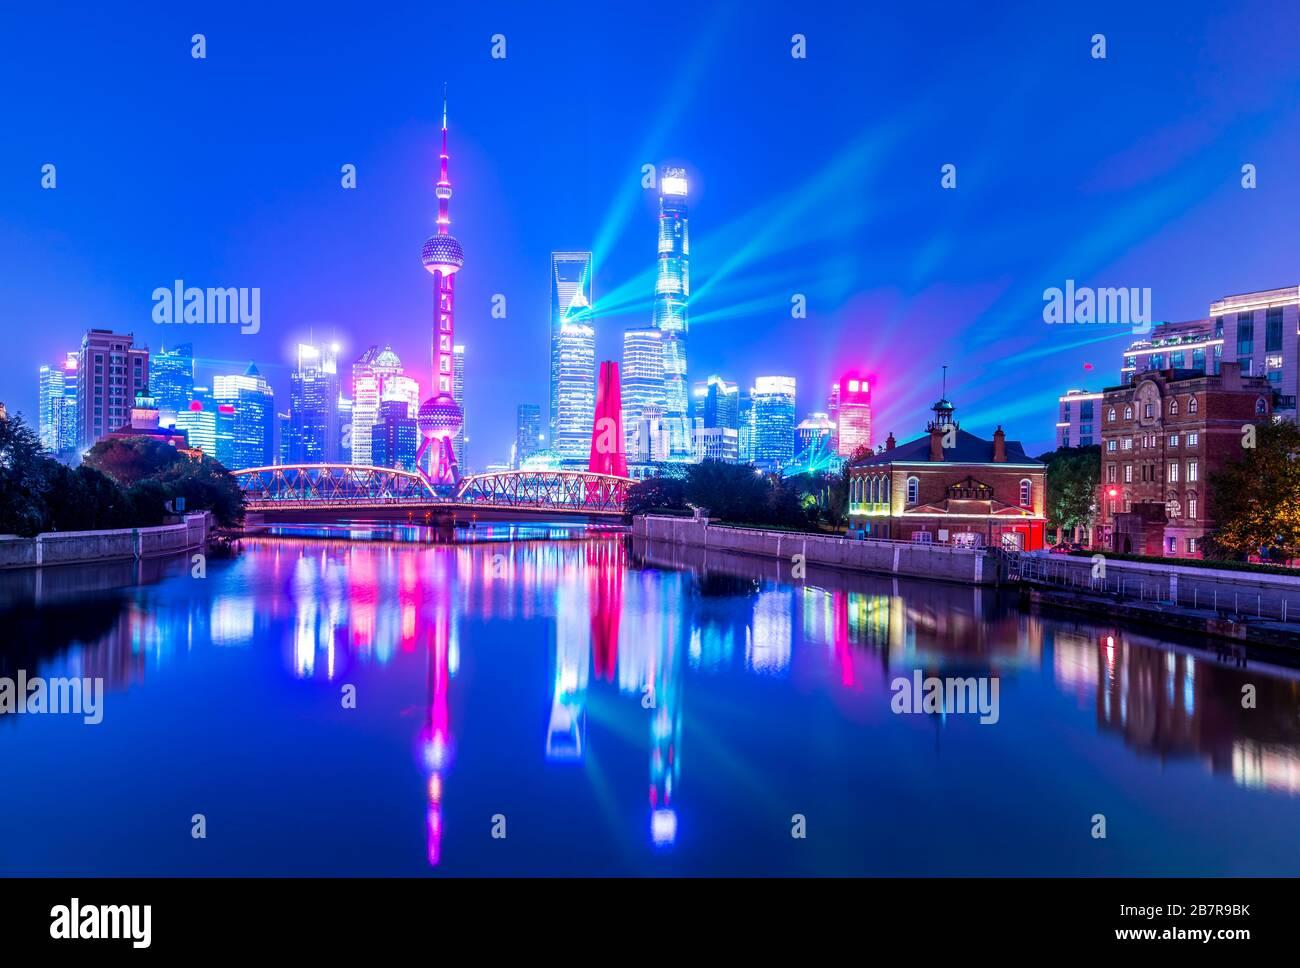 Shanghai Lujiazui skylines at night, China Stock Photo